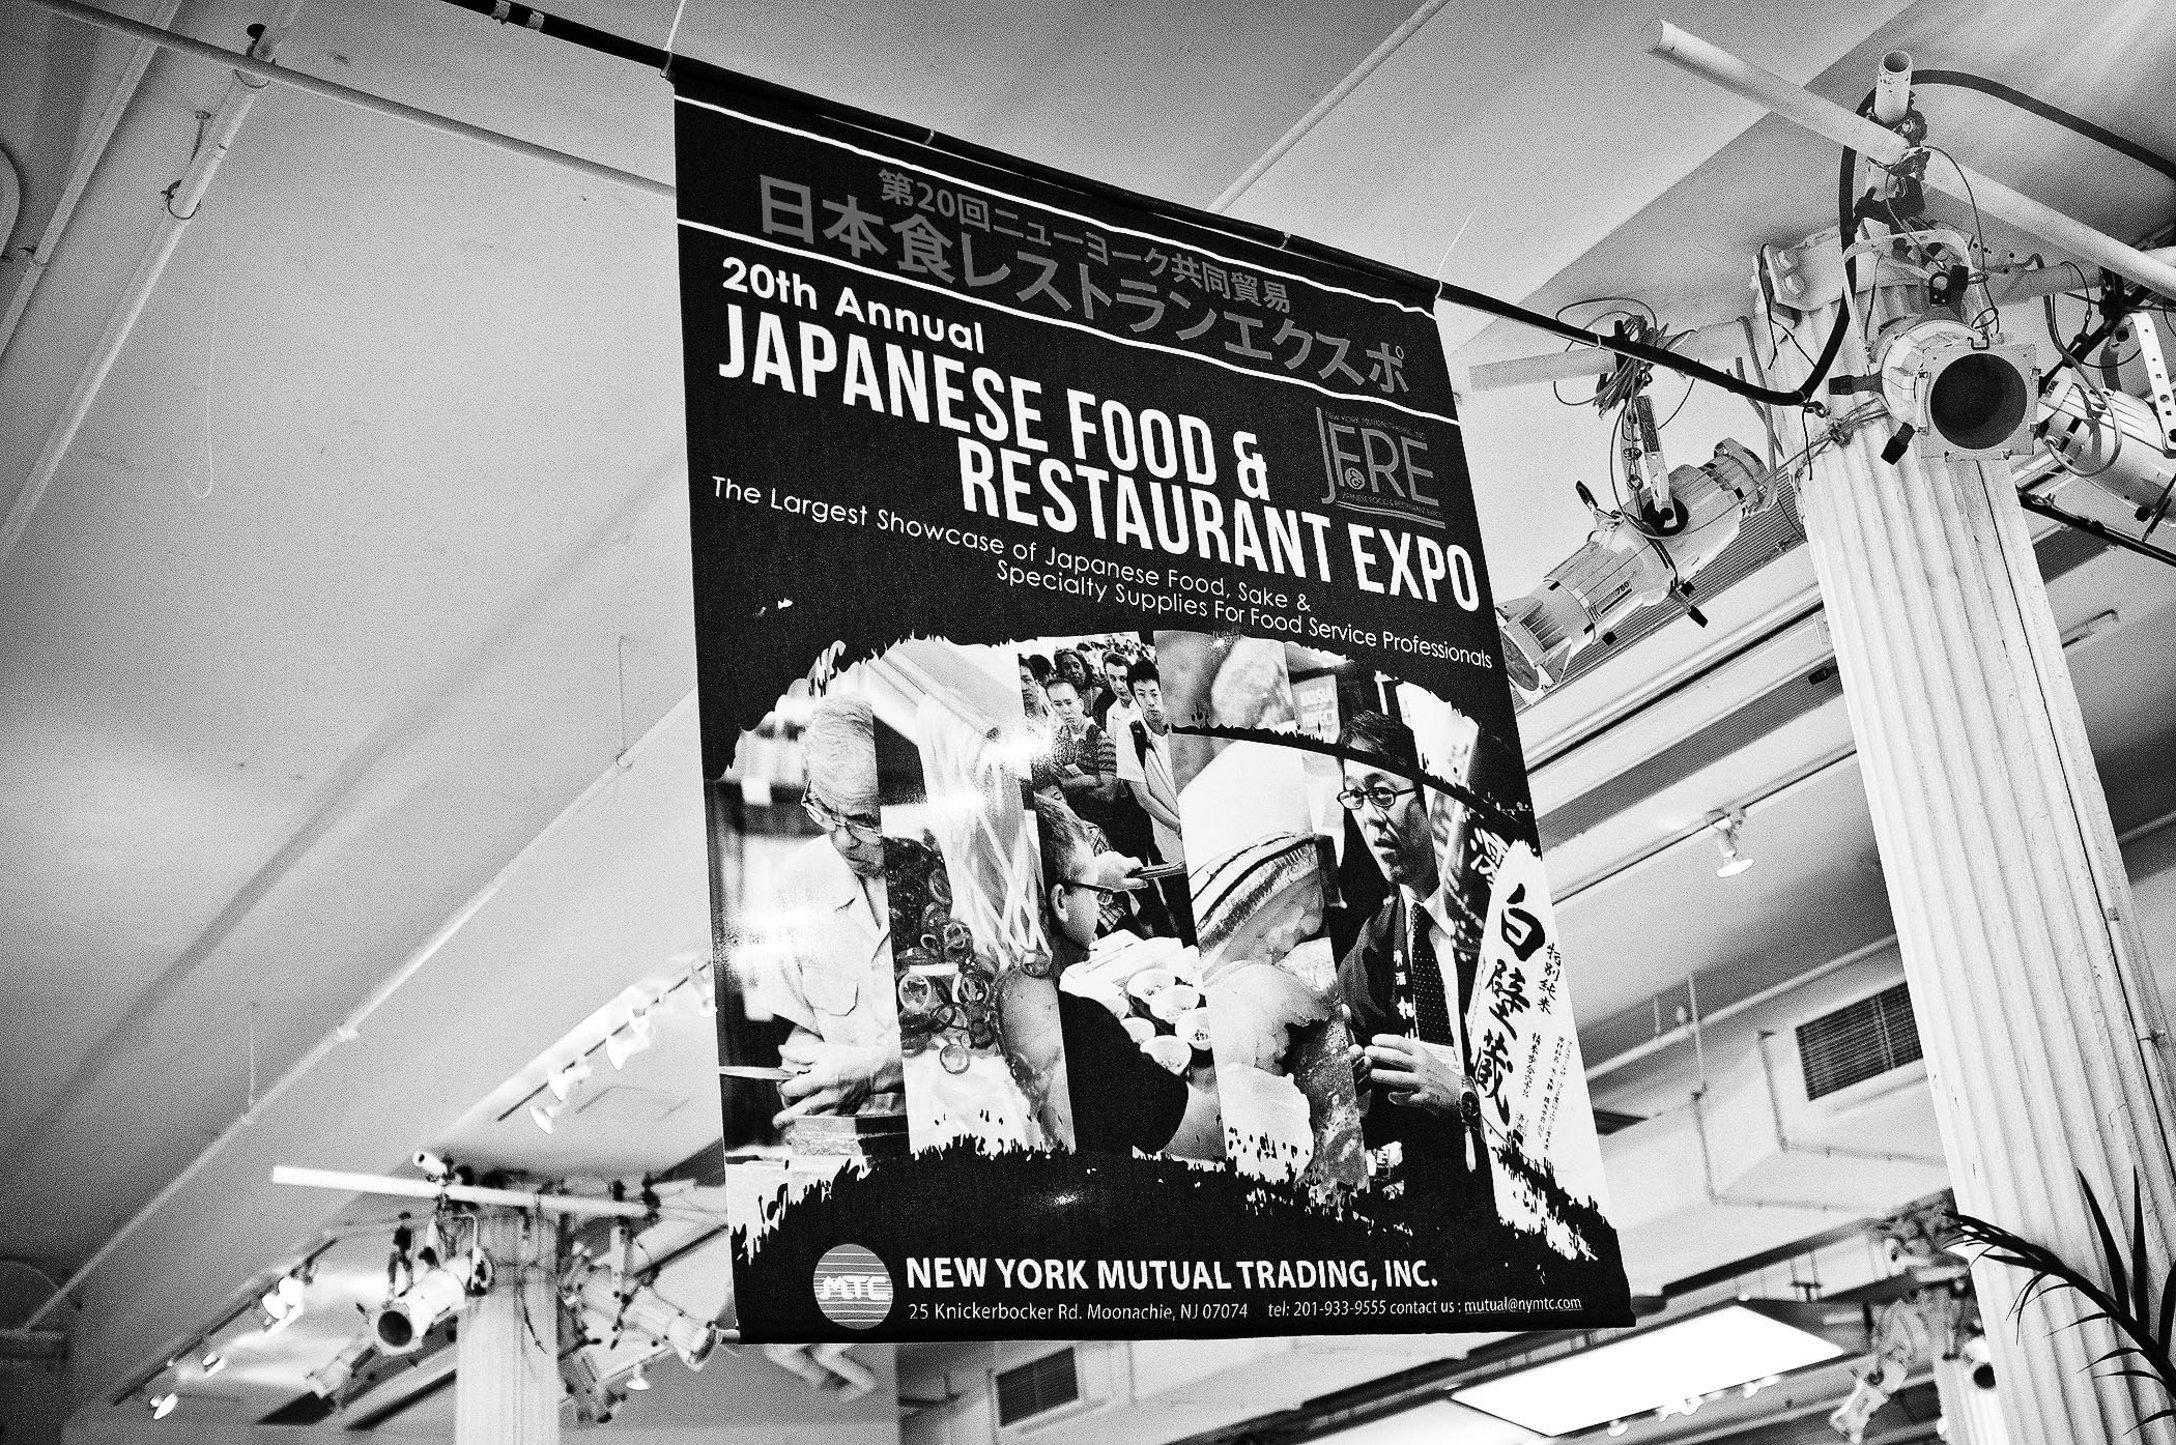 Japanese Food & Restaurant Show 2013